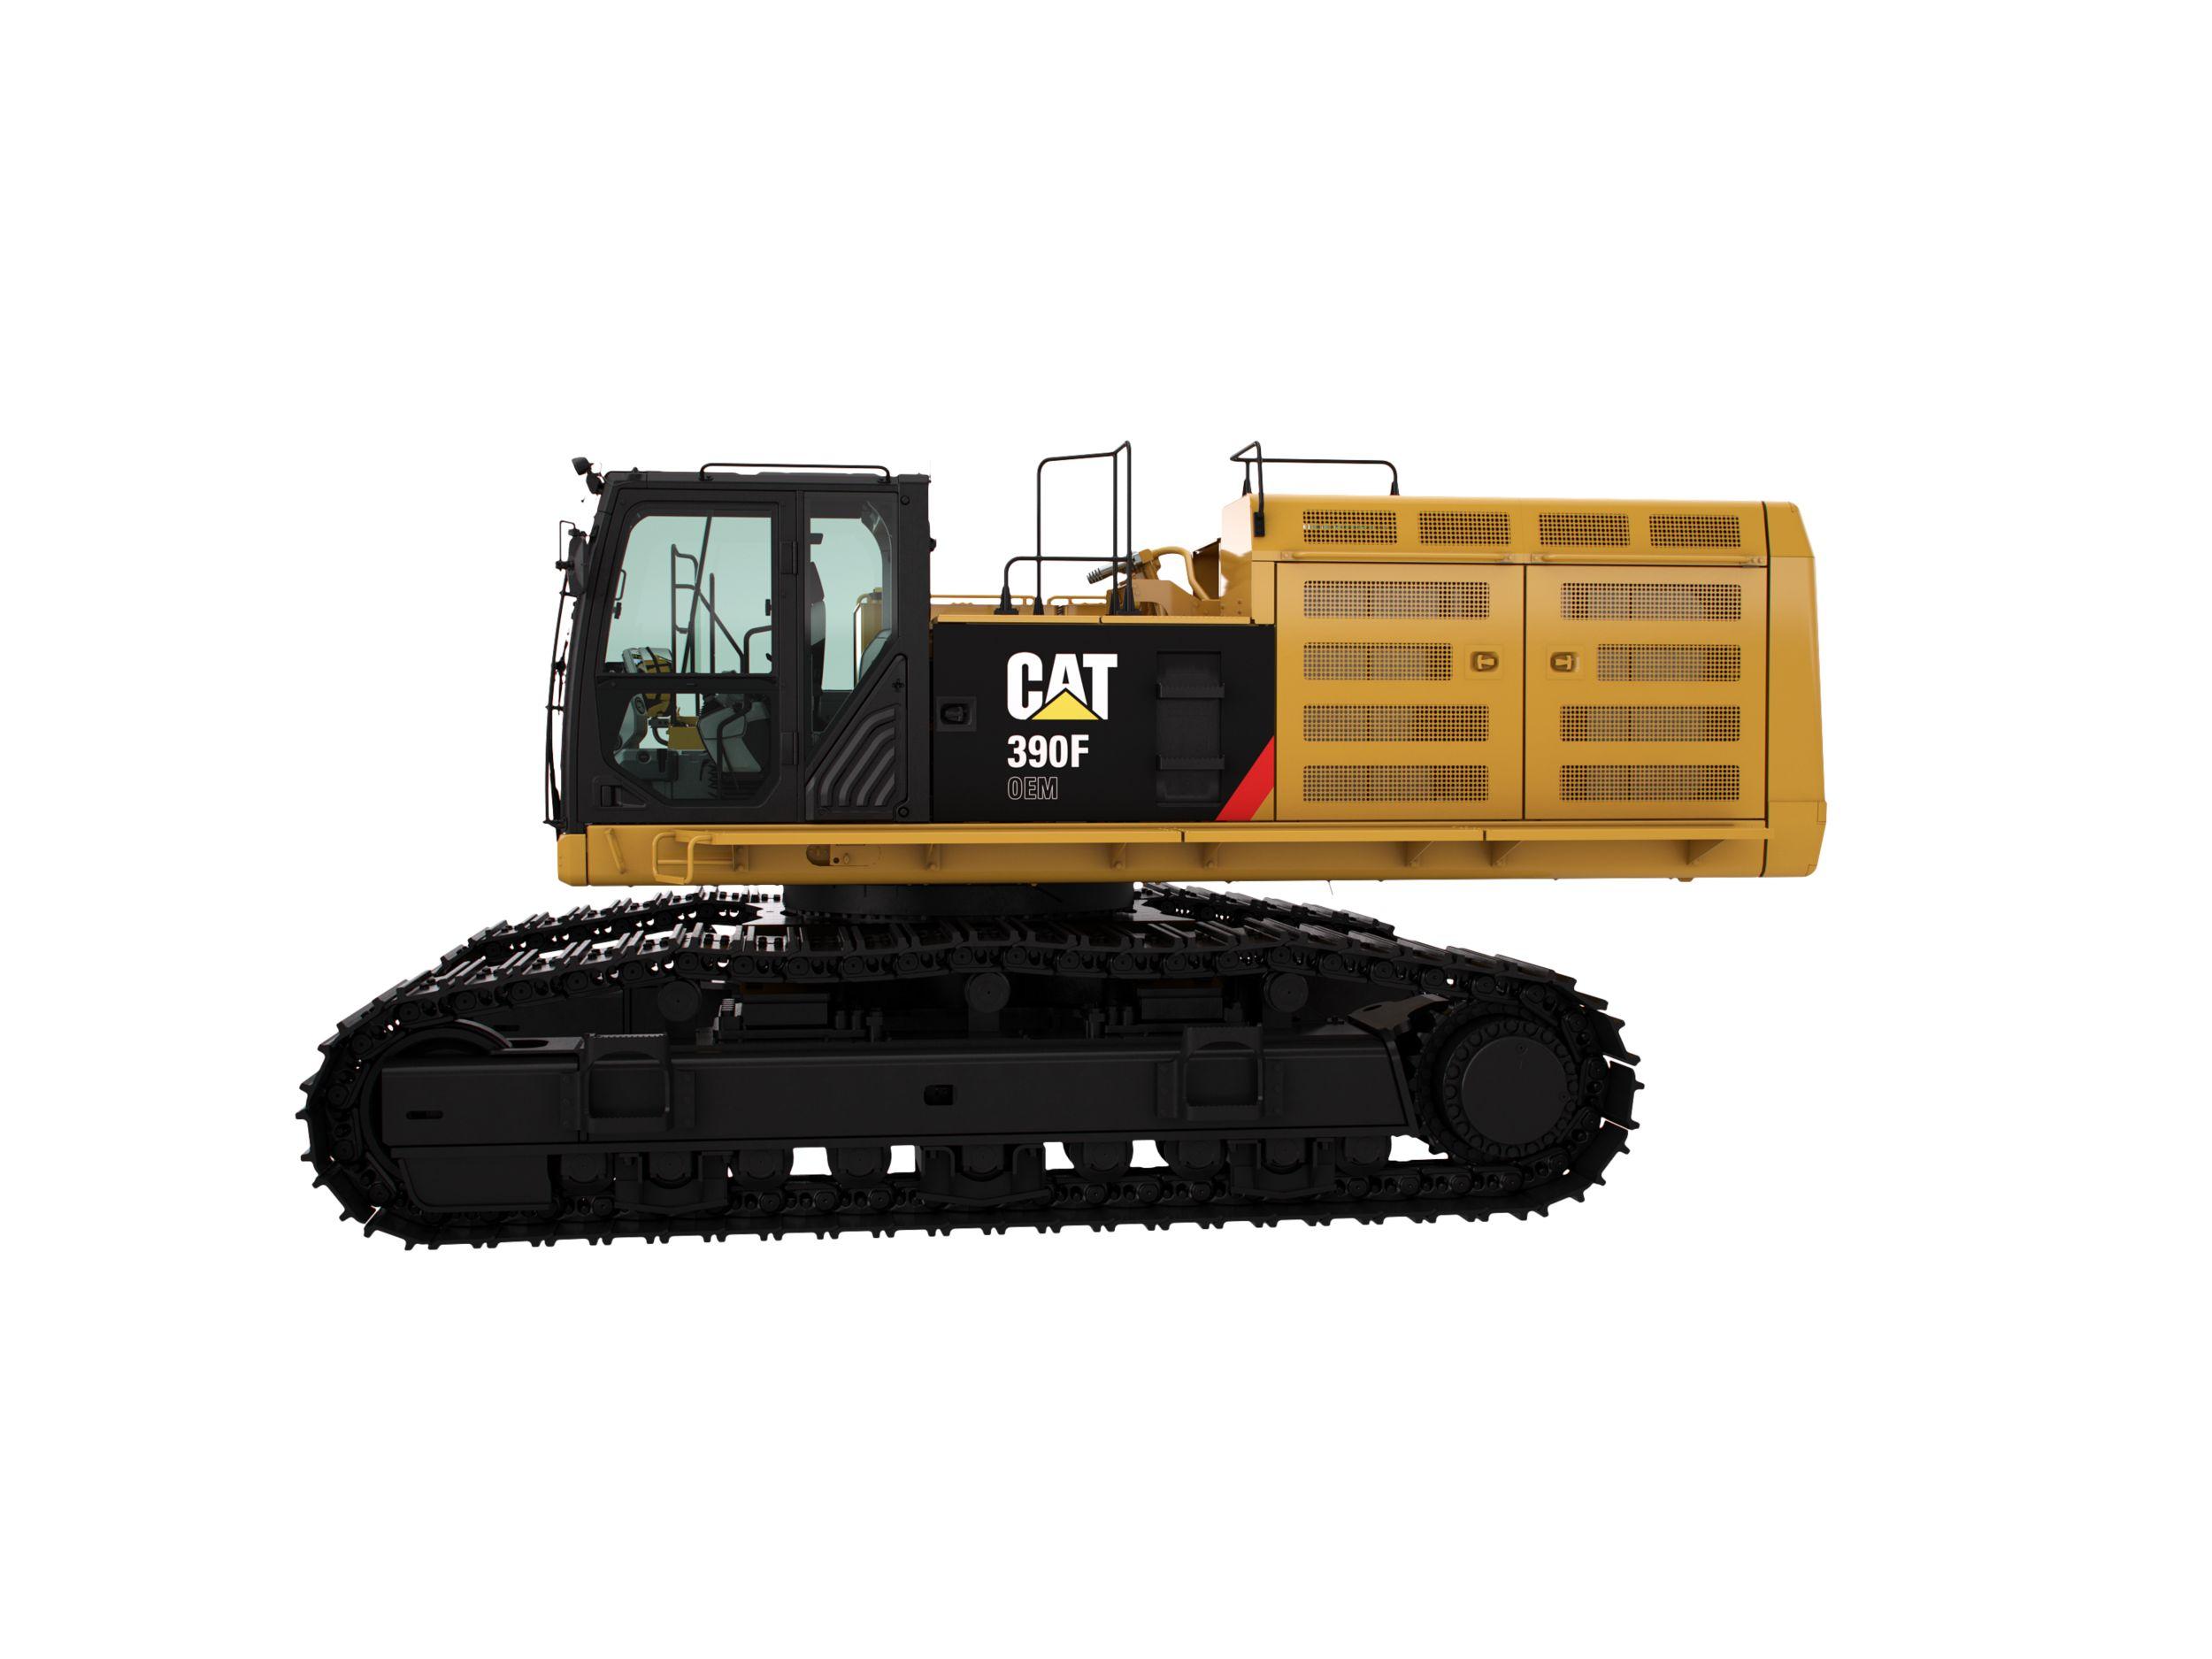 390F Frontless Excavator